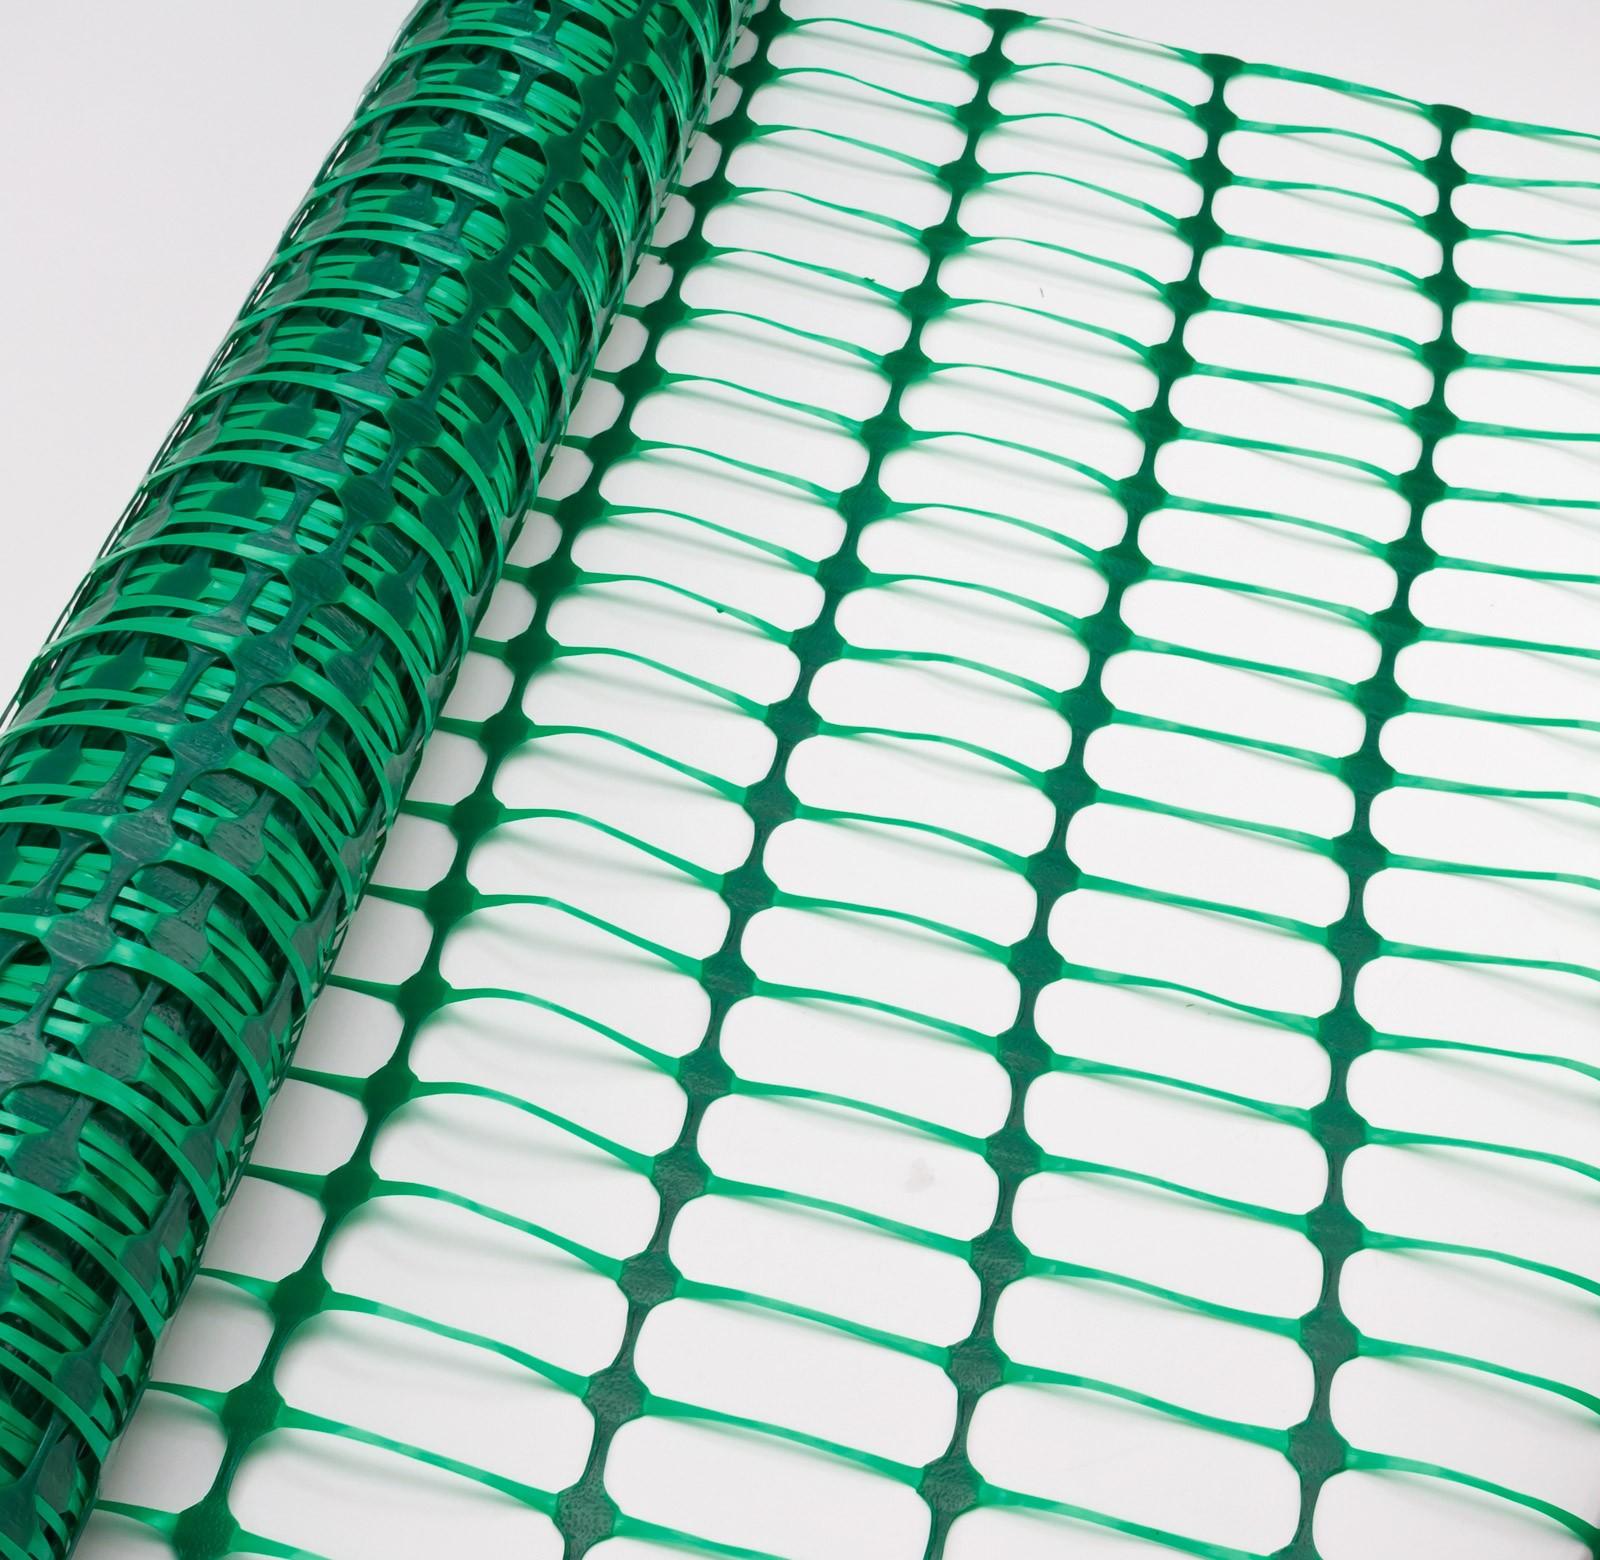 Dema Schutznetz Bauzaun Absicherungszaun Warnnetz Wildzaun Waldzaun Grün 30 x 1 Meter 31247